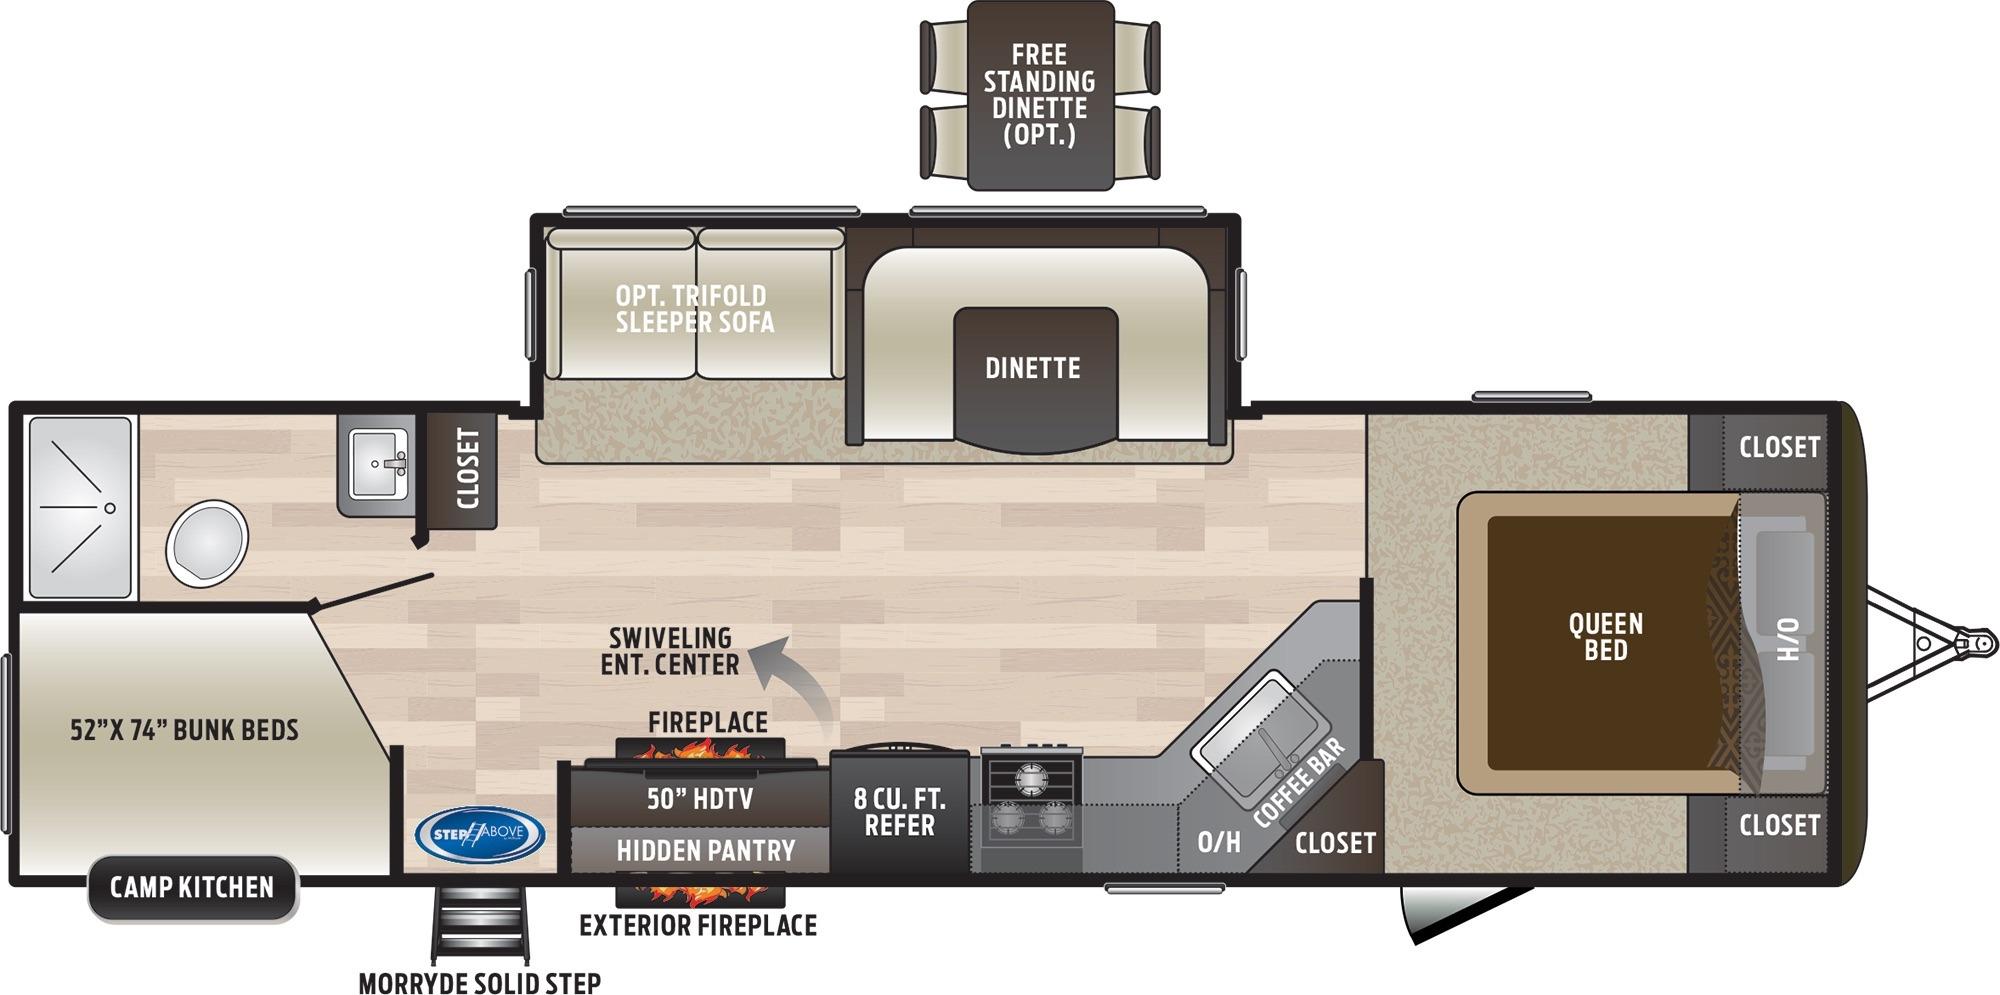 View Floor Plan for 2019 KEYSTONE HIDEOUT 29DFS